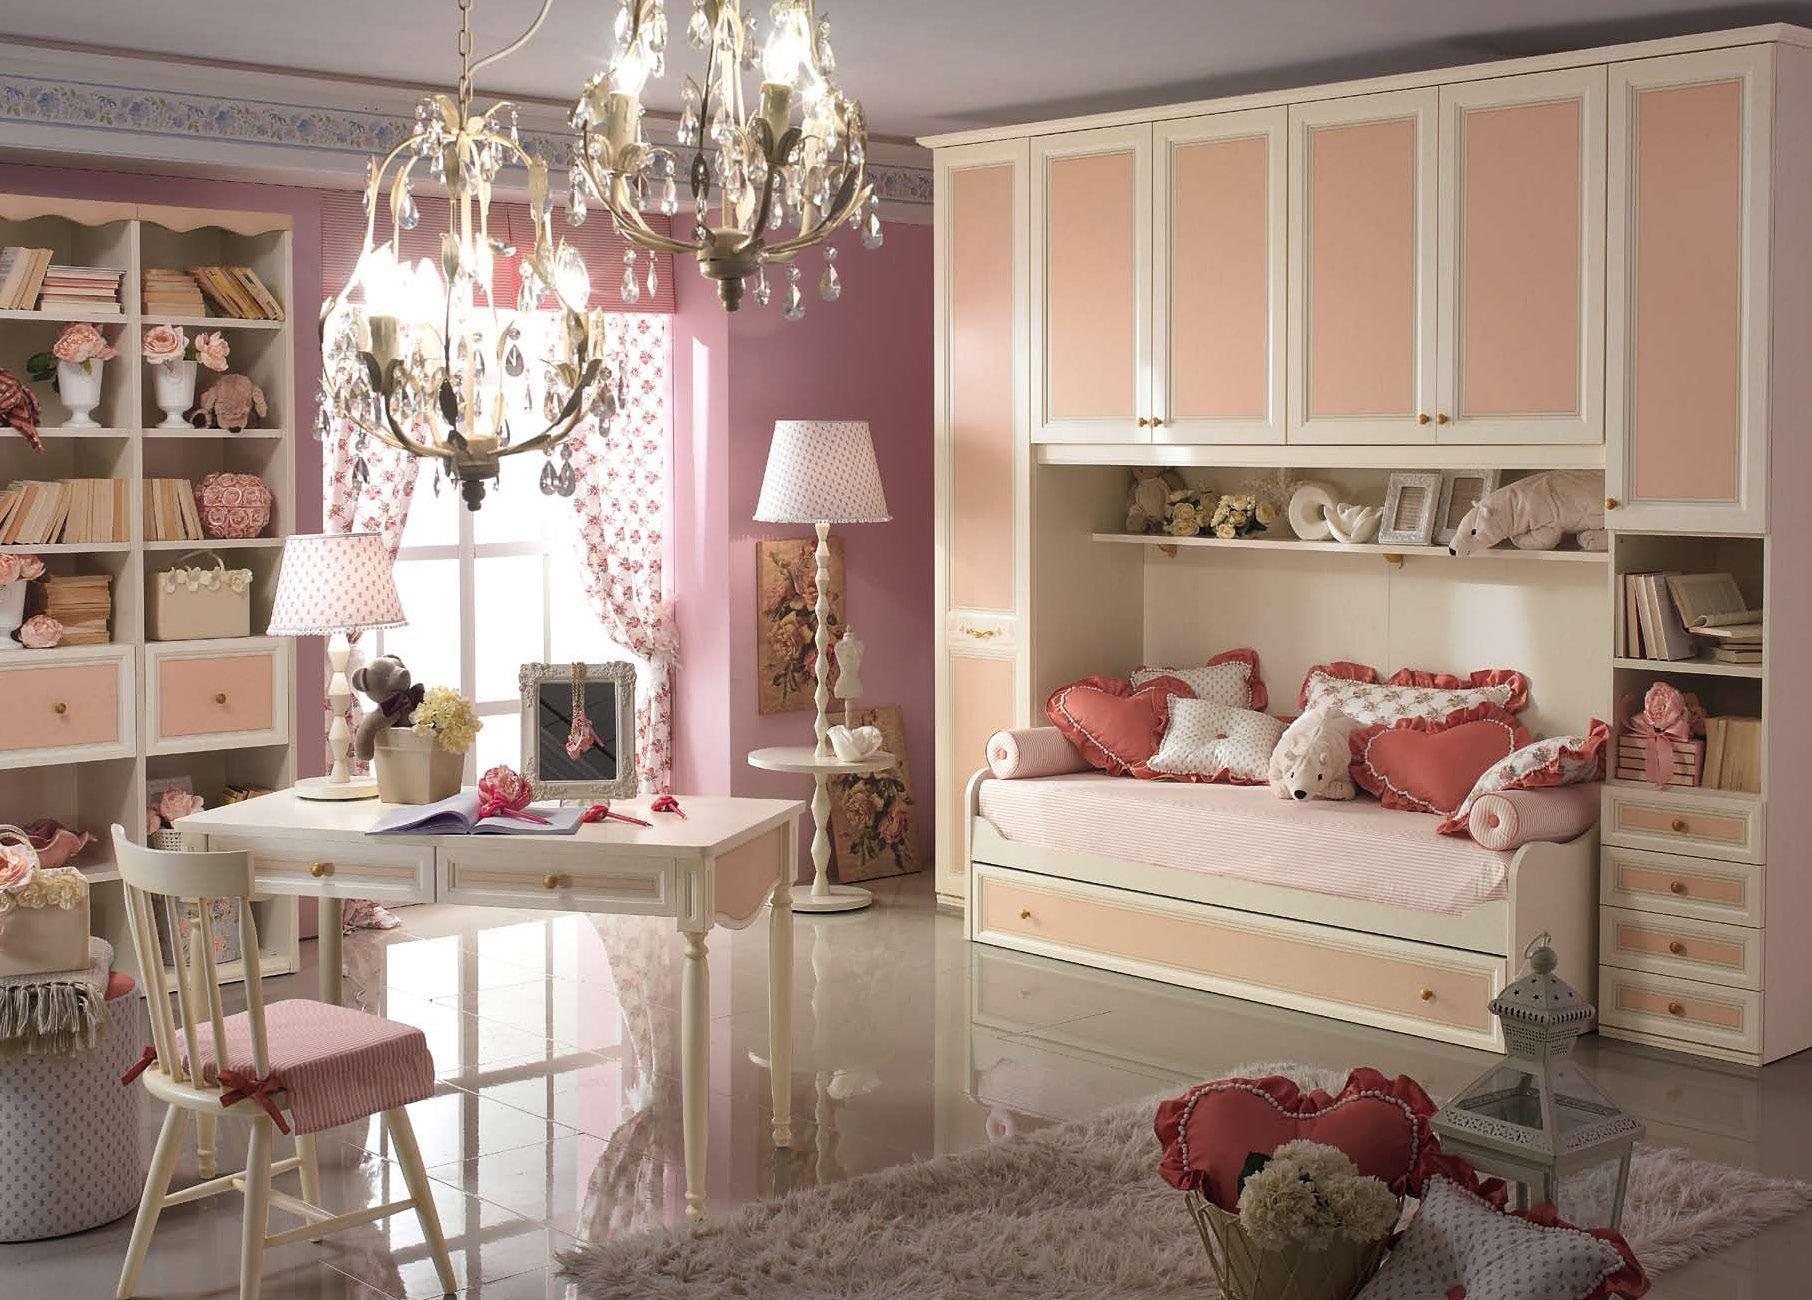 Camere Da Letto Imab Group.Cameretta Amelie Imab Group Camerette Nel 2019 Bedroom Decor